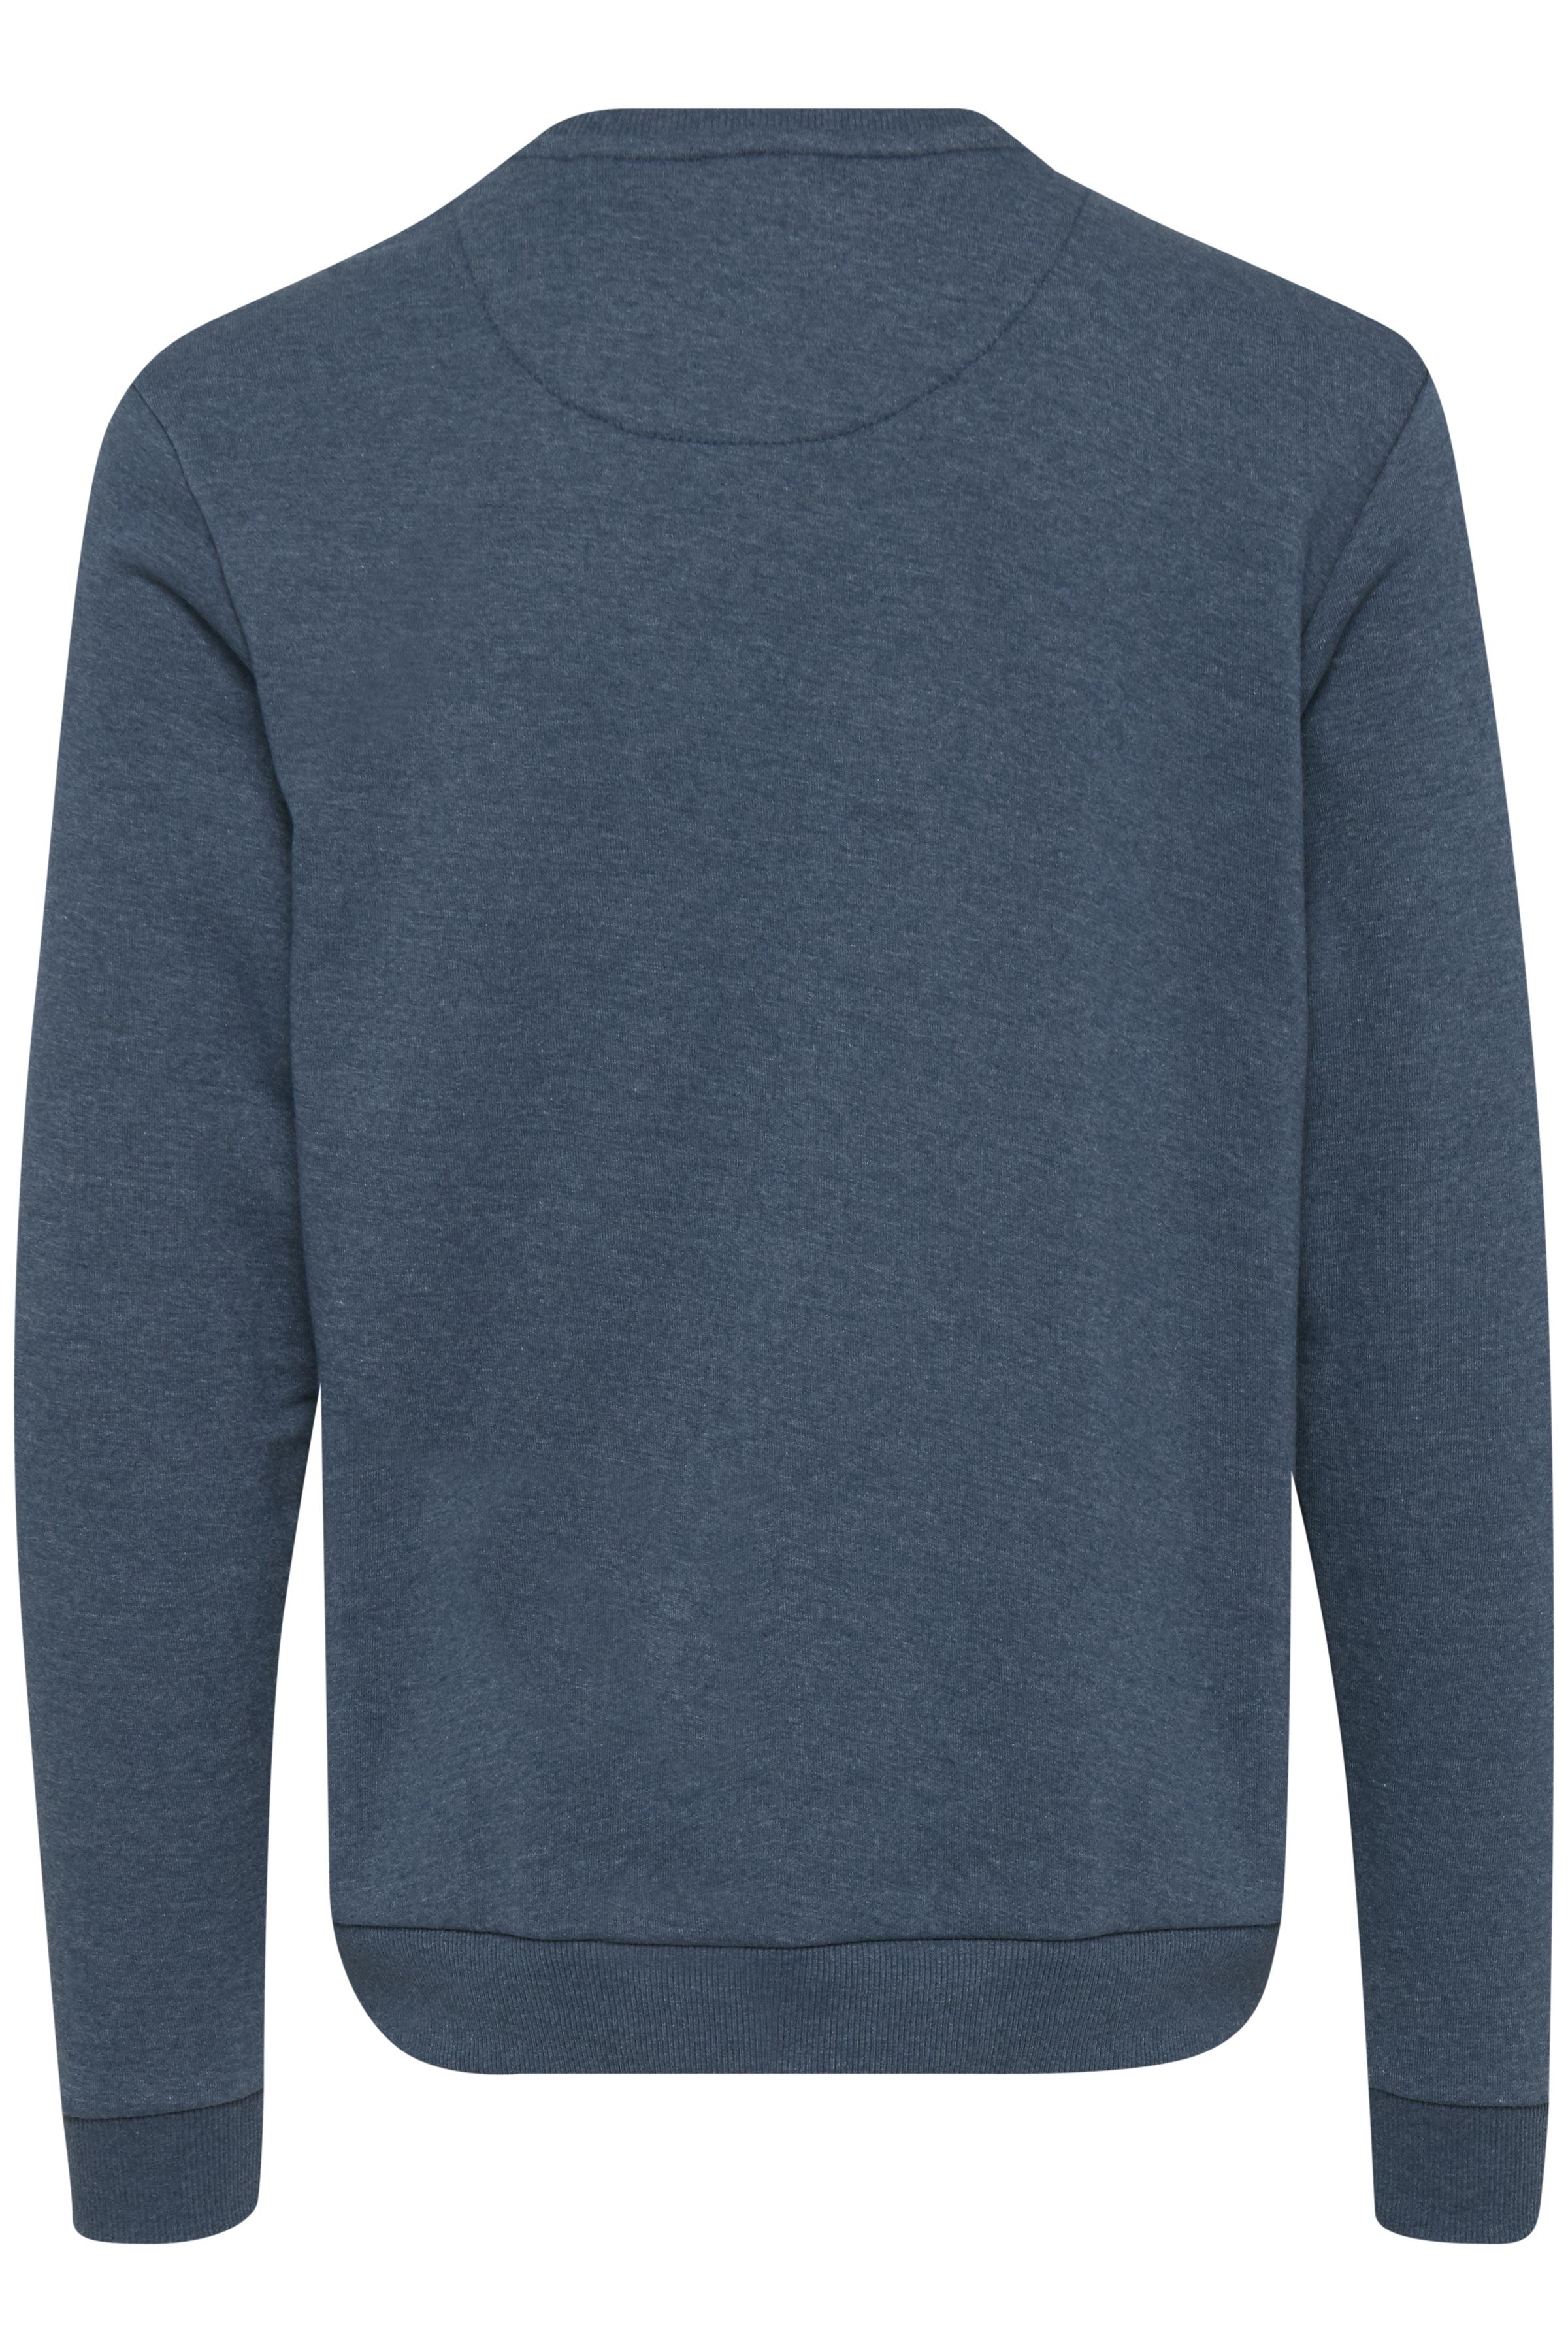 Majolica Blue Sweatshirt – Køb Majolica Blue Sweatshirt fra str. S-XL her